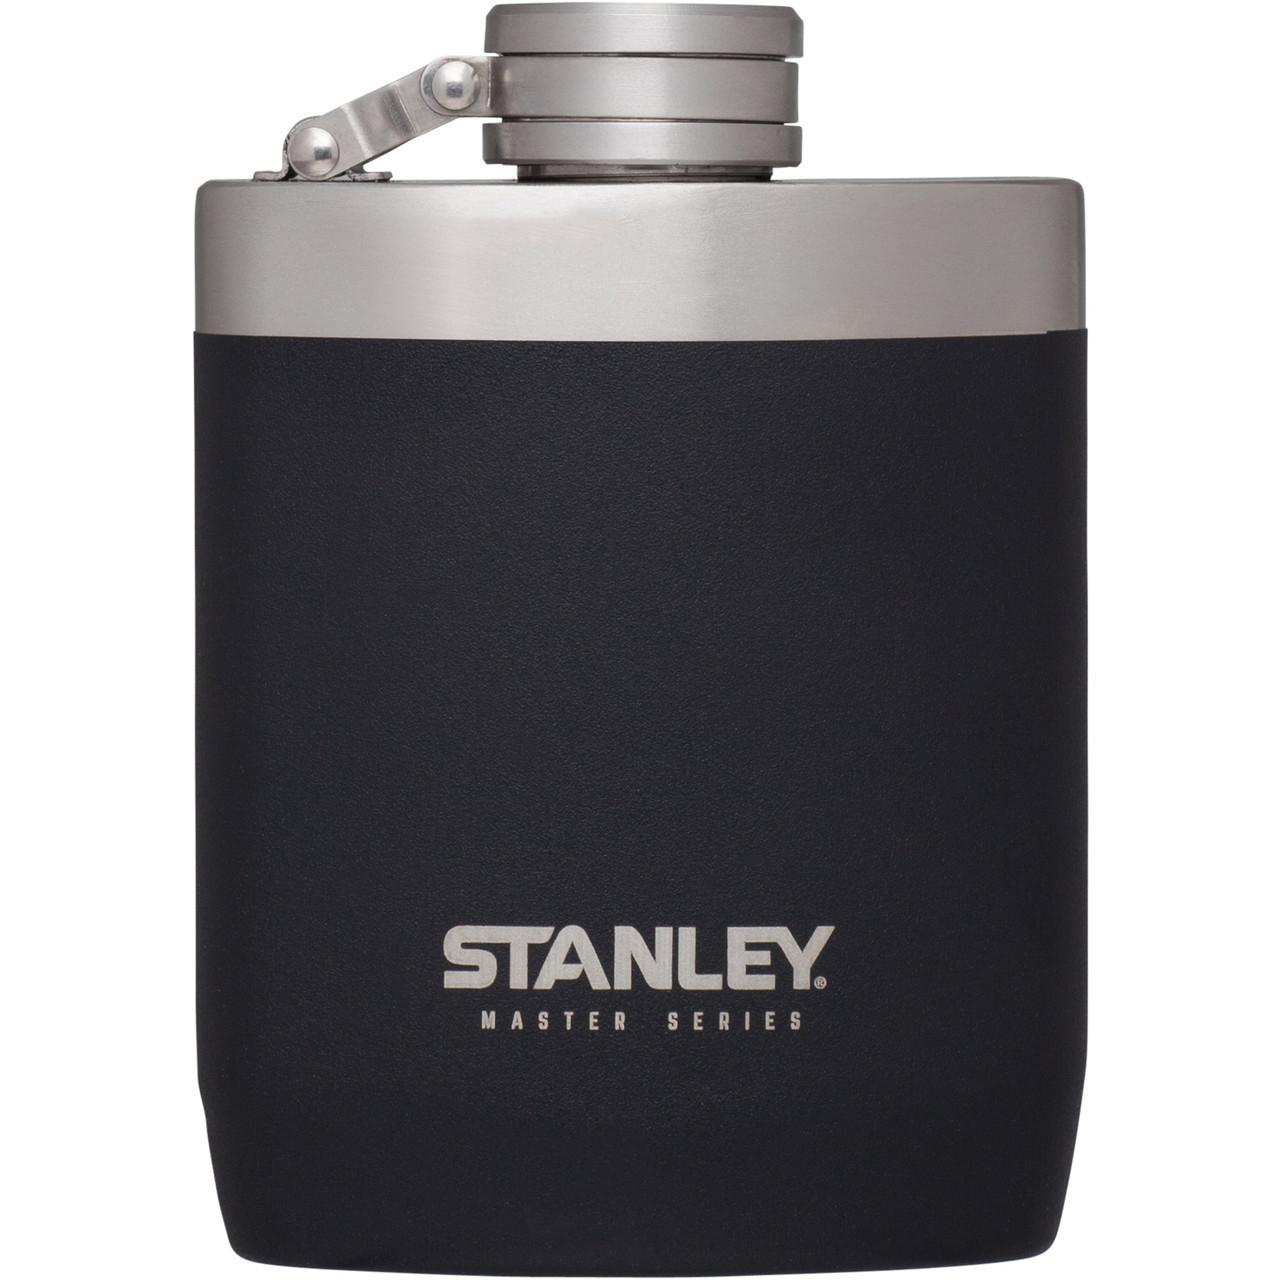 Фляга STANLEY Master Pocket Flask Black 230 ml. (10-02892-002)